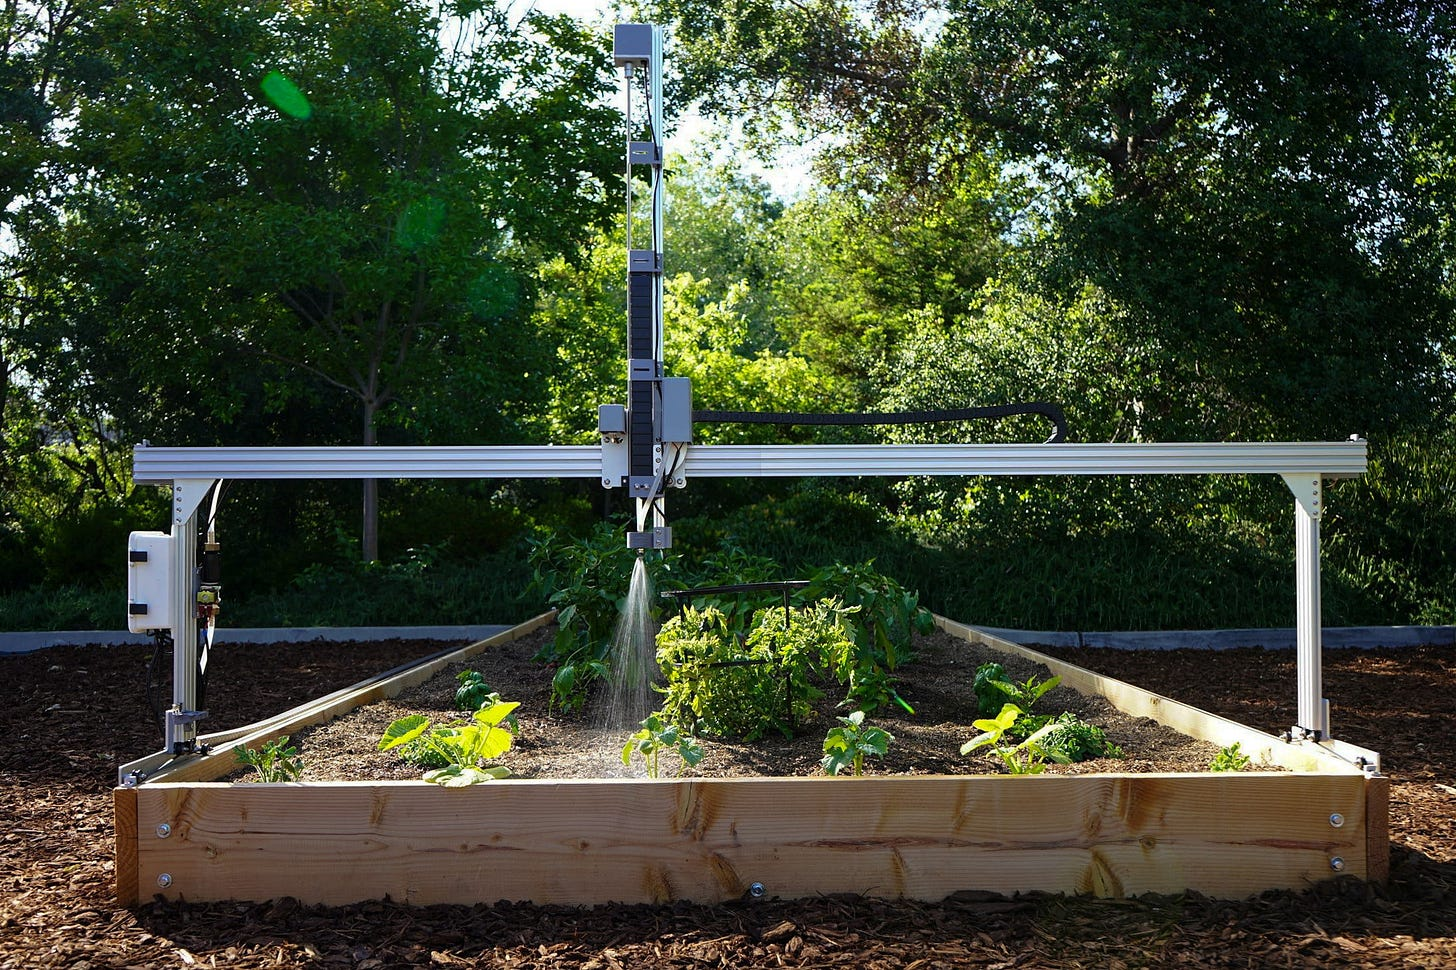 FarmBot DIY Gardening Robots Allow You to Harvest More Produce ...